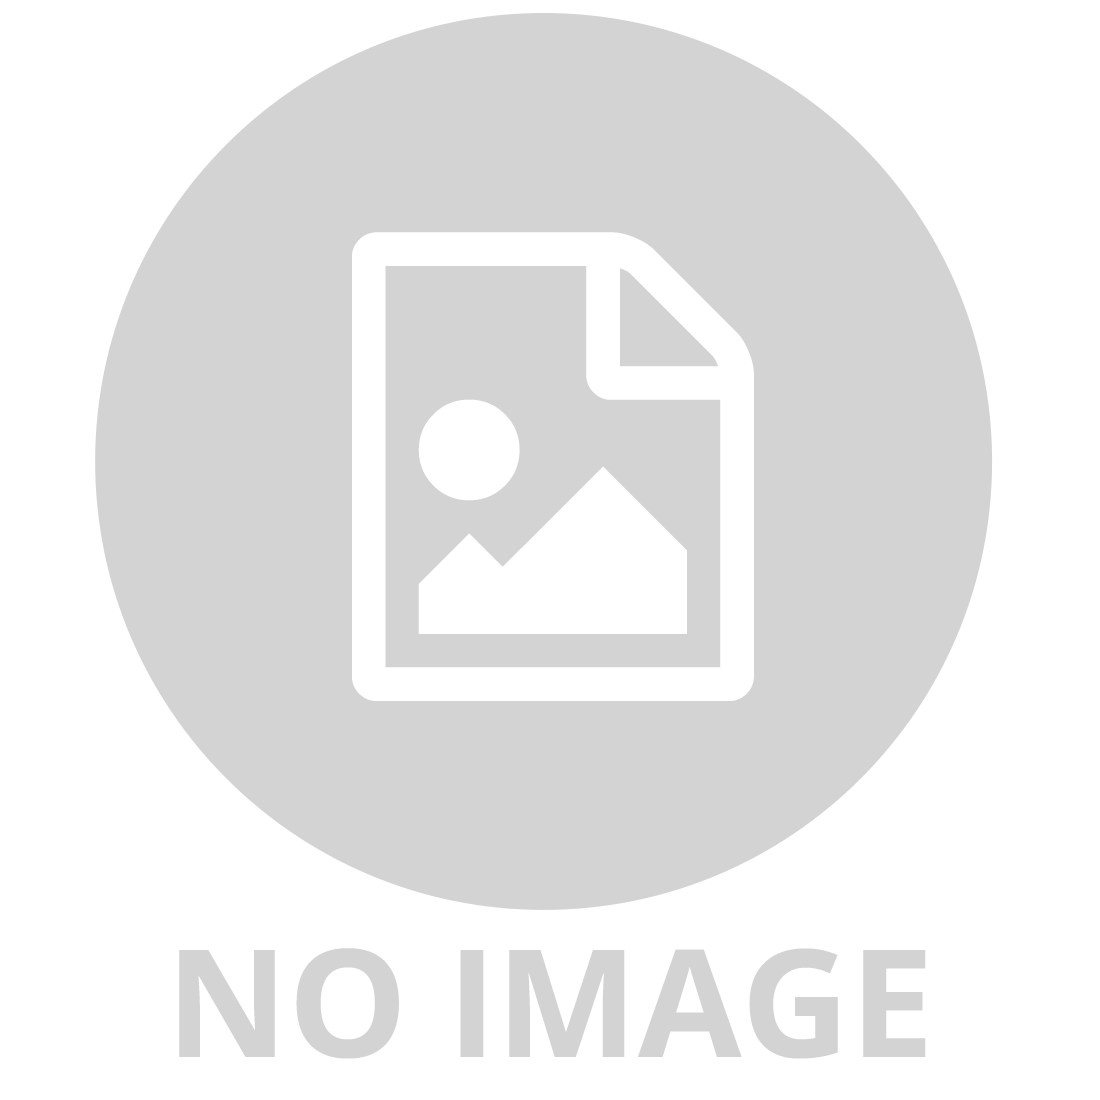 LEAPFROG LEAPPAD ULTIMATE READY FOR SCHOOL TABLET